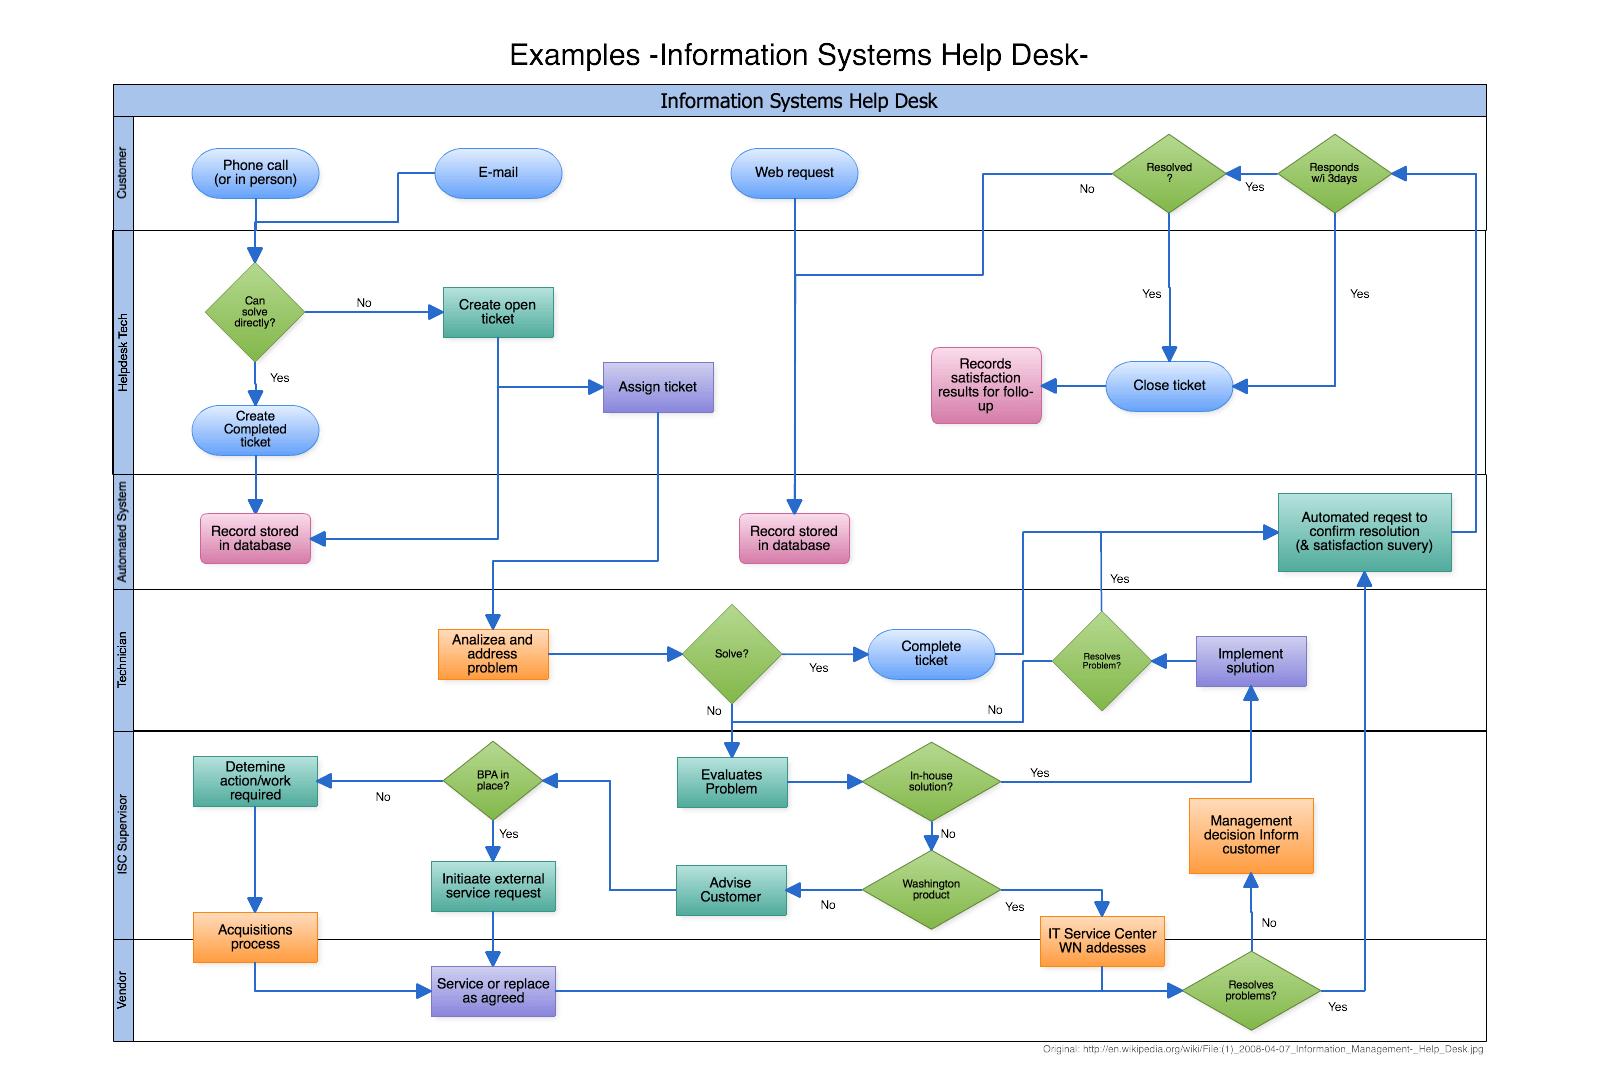 visio swim lane diagram template tennant t1 wiring imágenes de diagramas flujo |